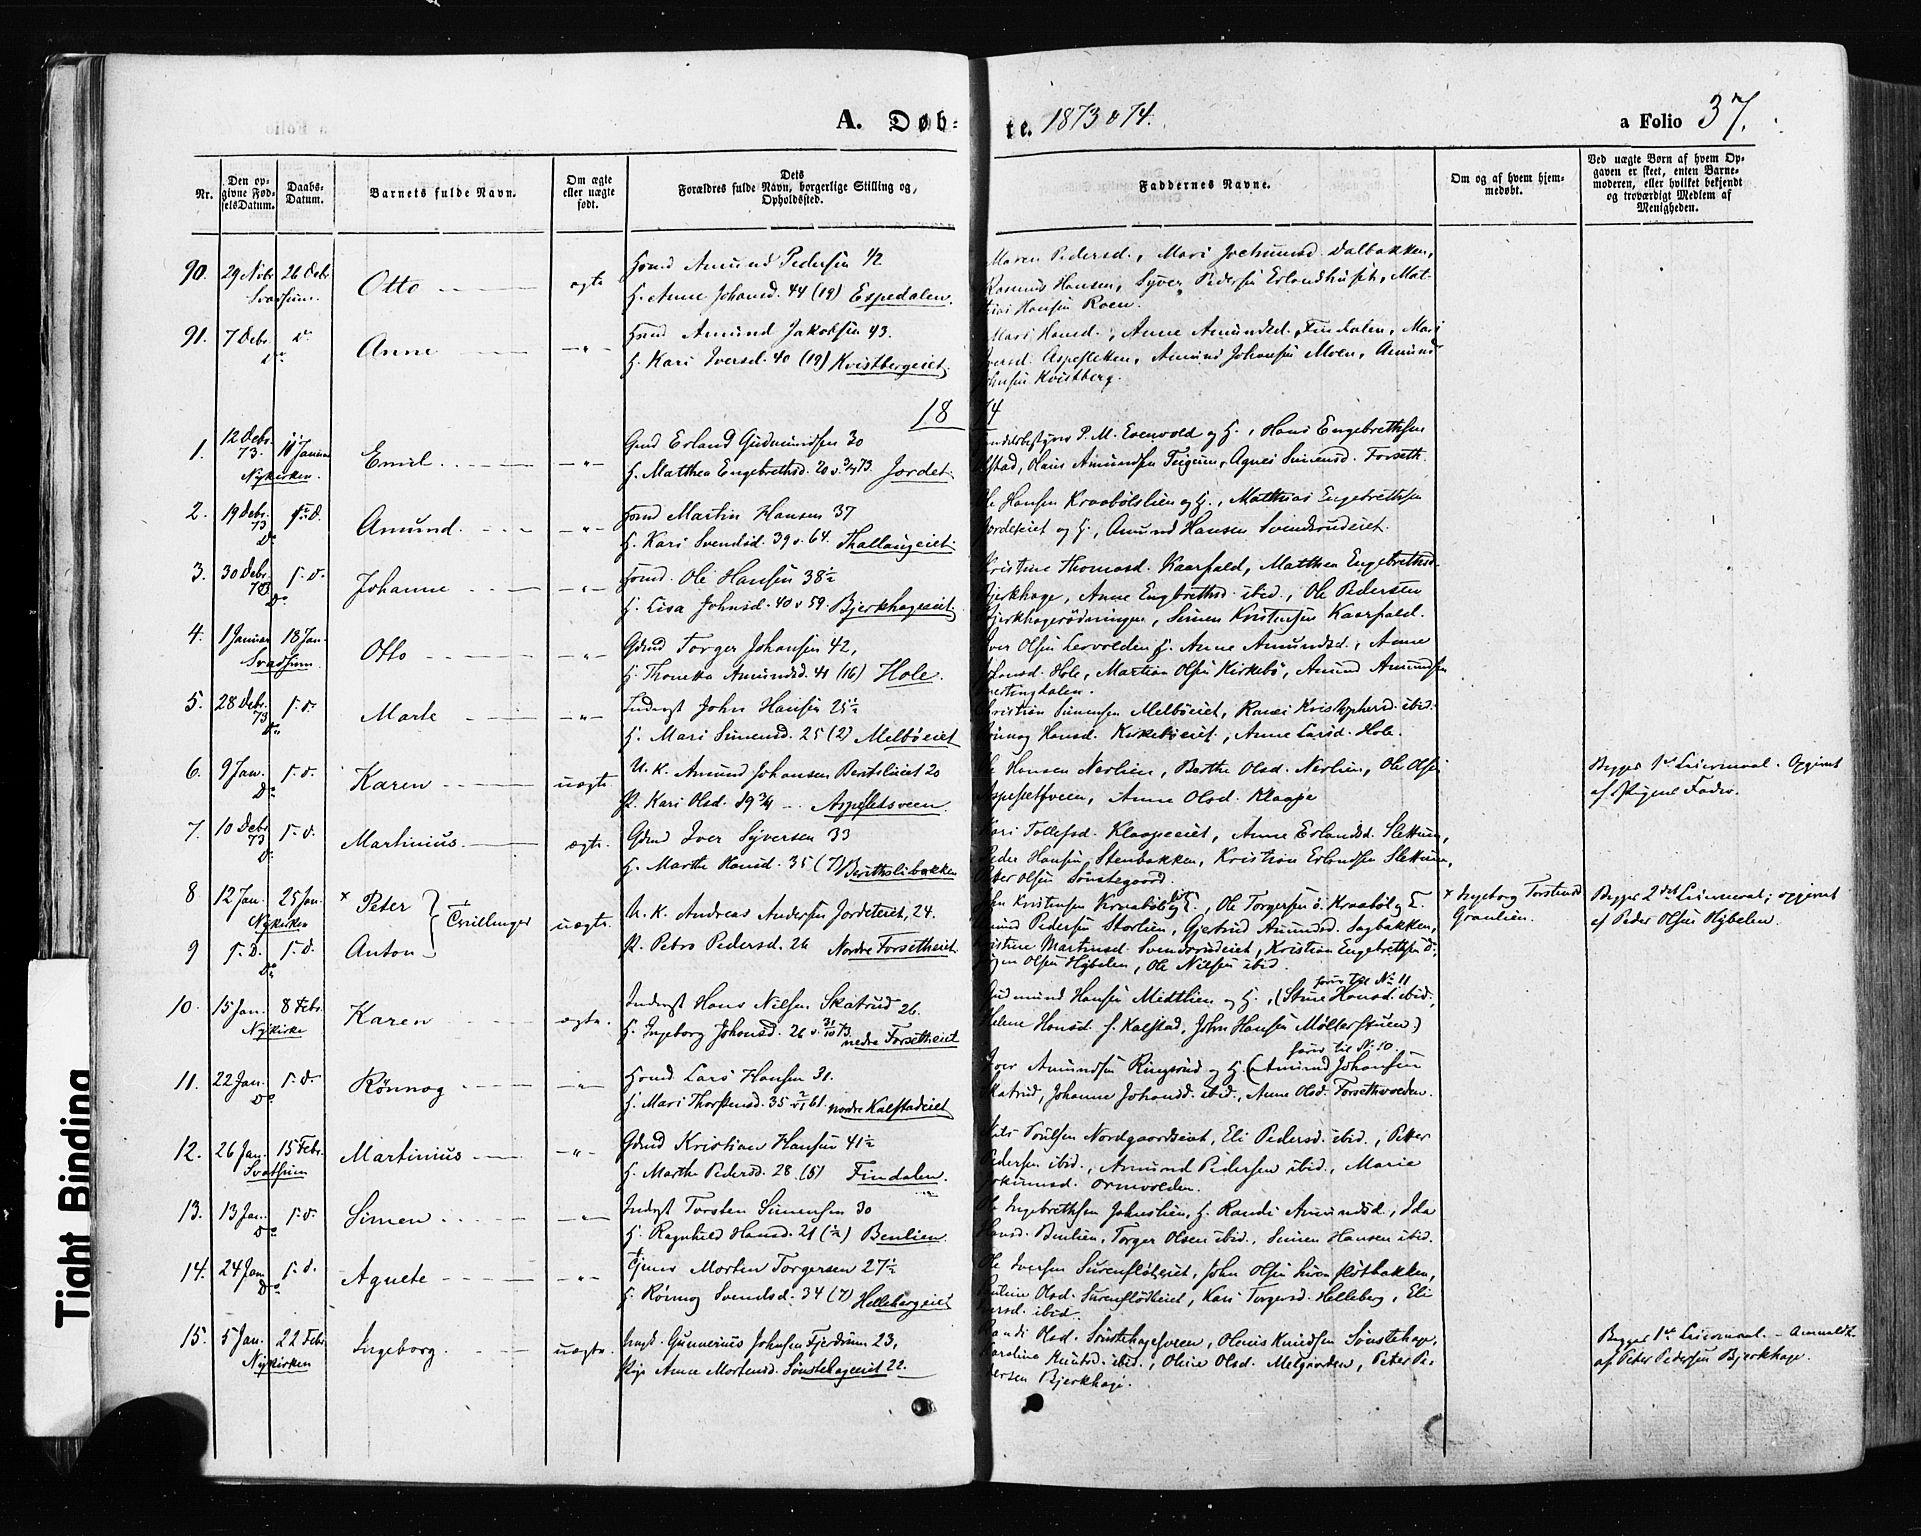 SAH, Gausdal prestekontor, Ministerialbok nr. 10, 1867-1886, s. 37